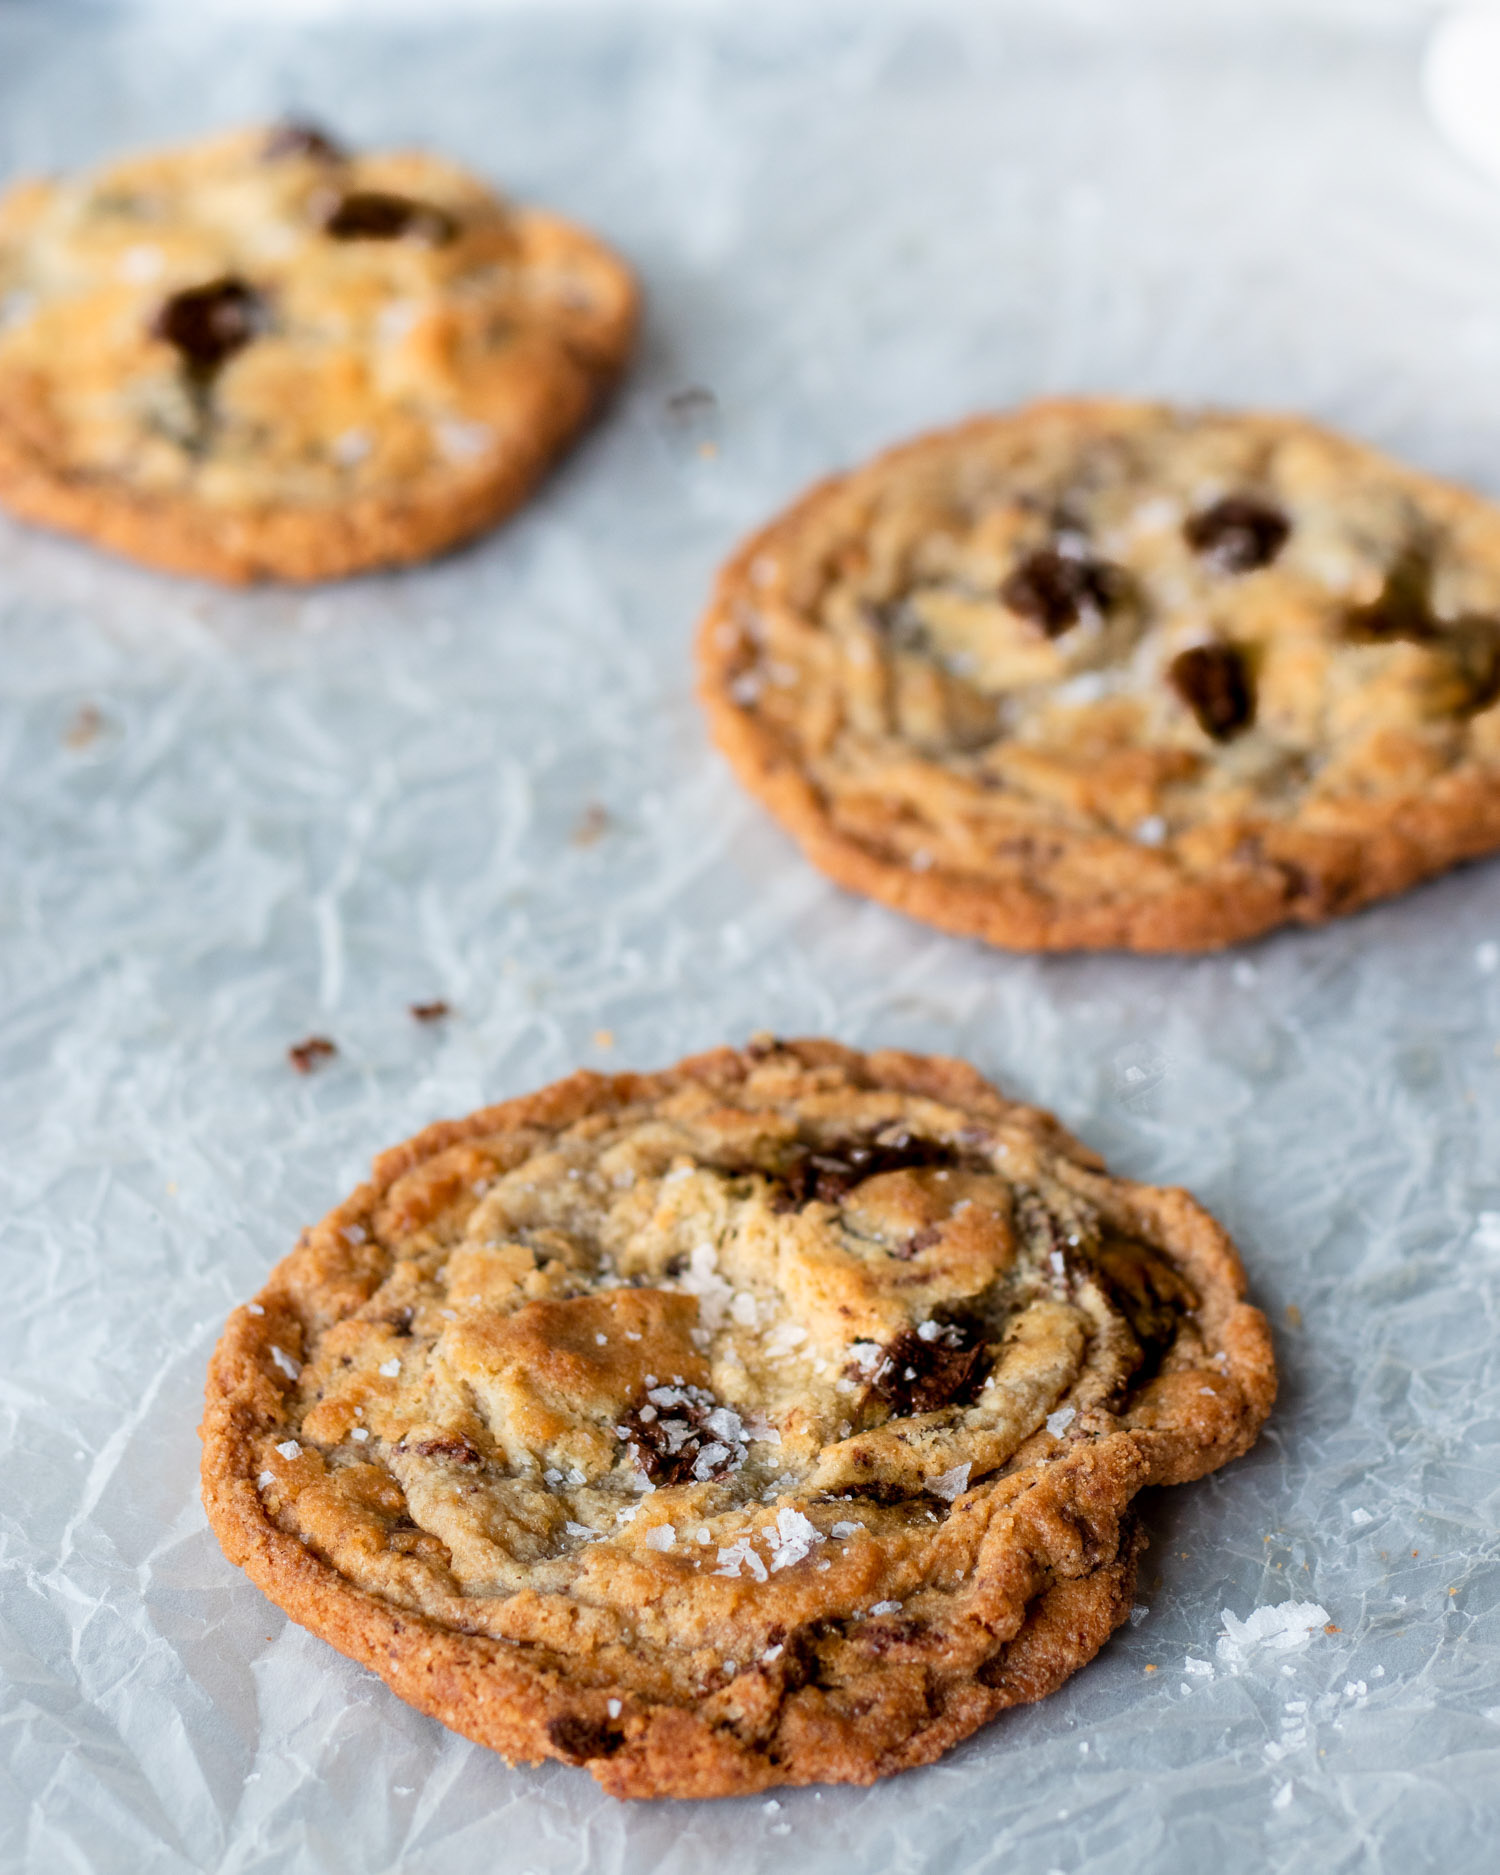 tahini-chocolate-cookies-on-tray